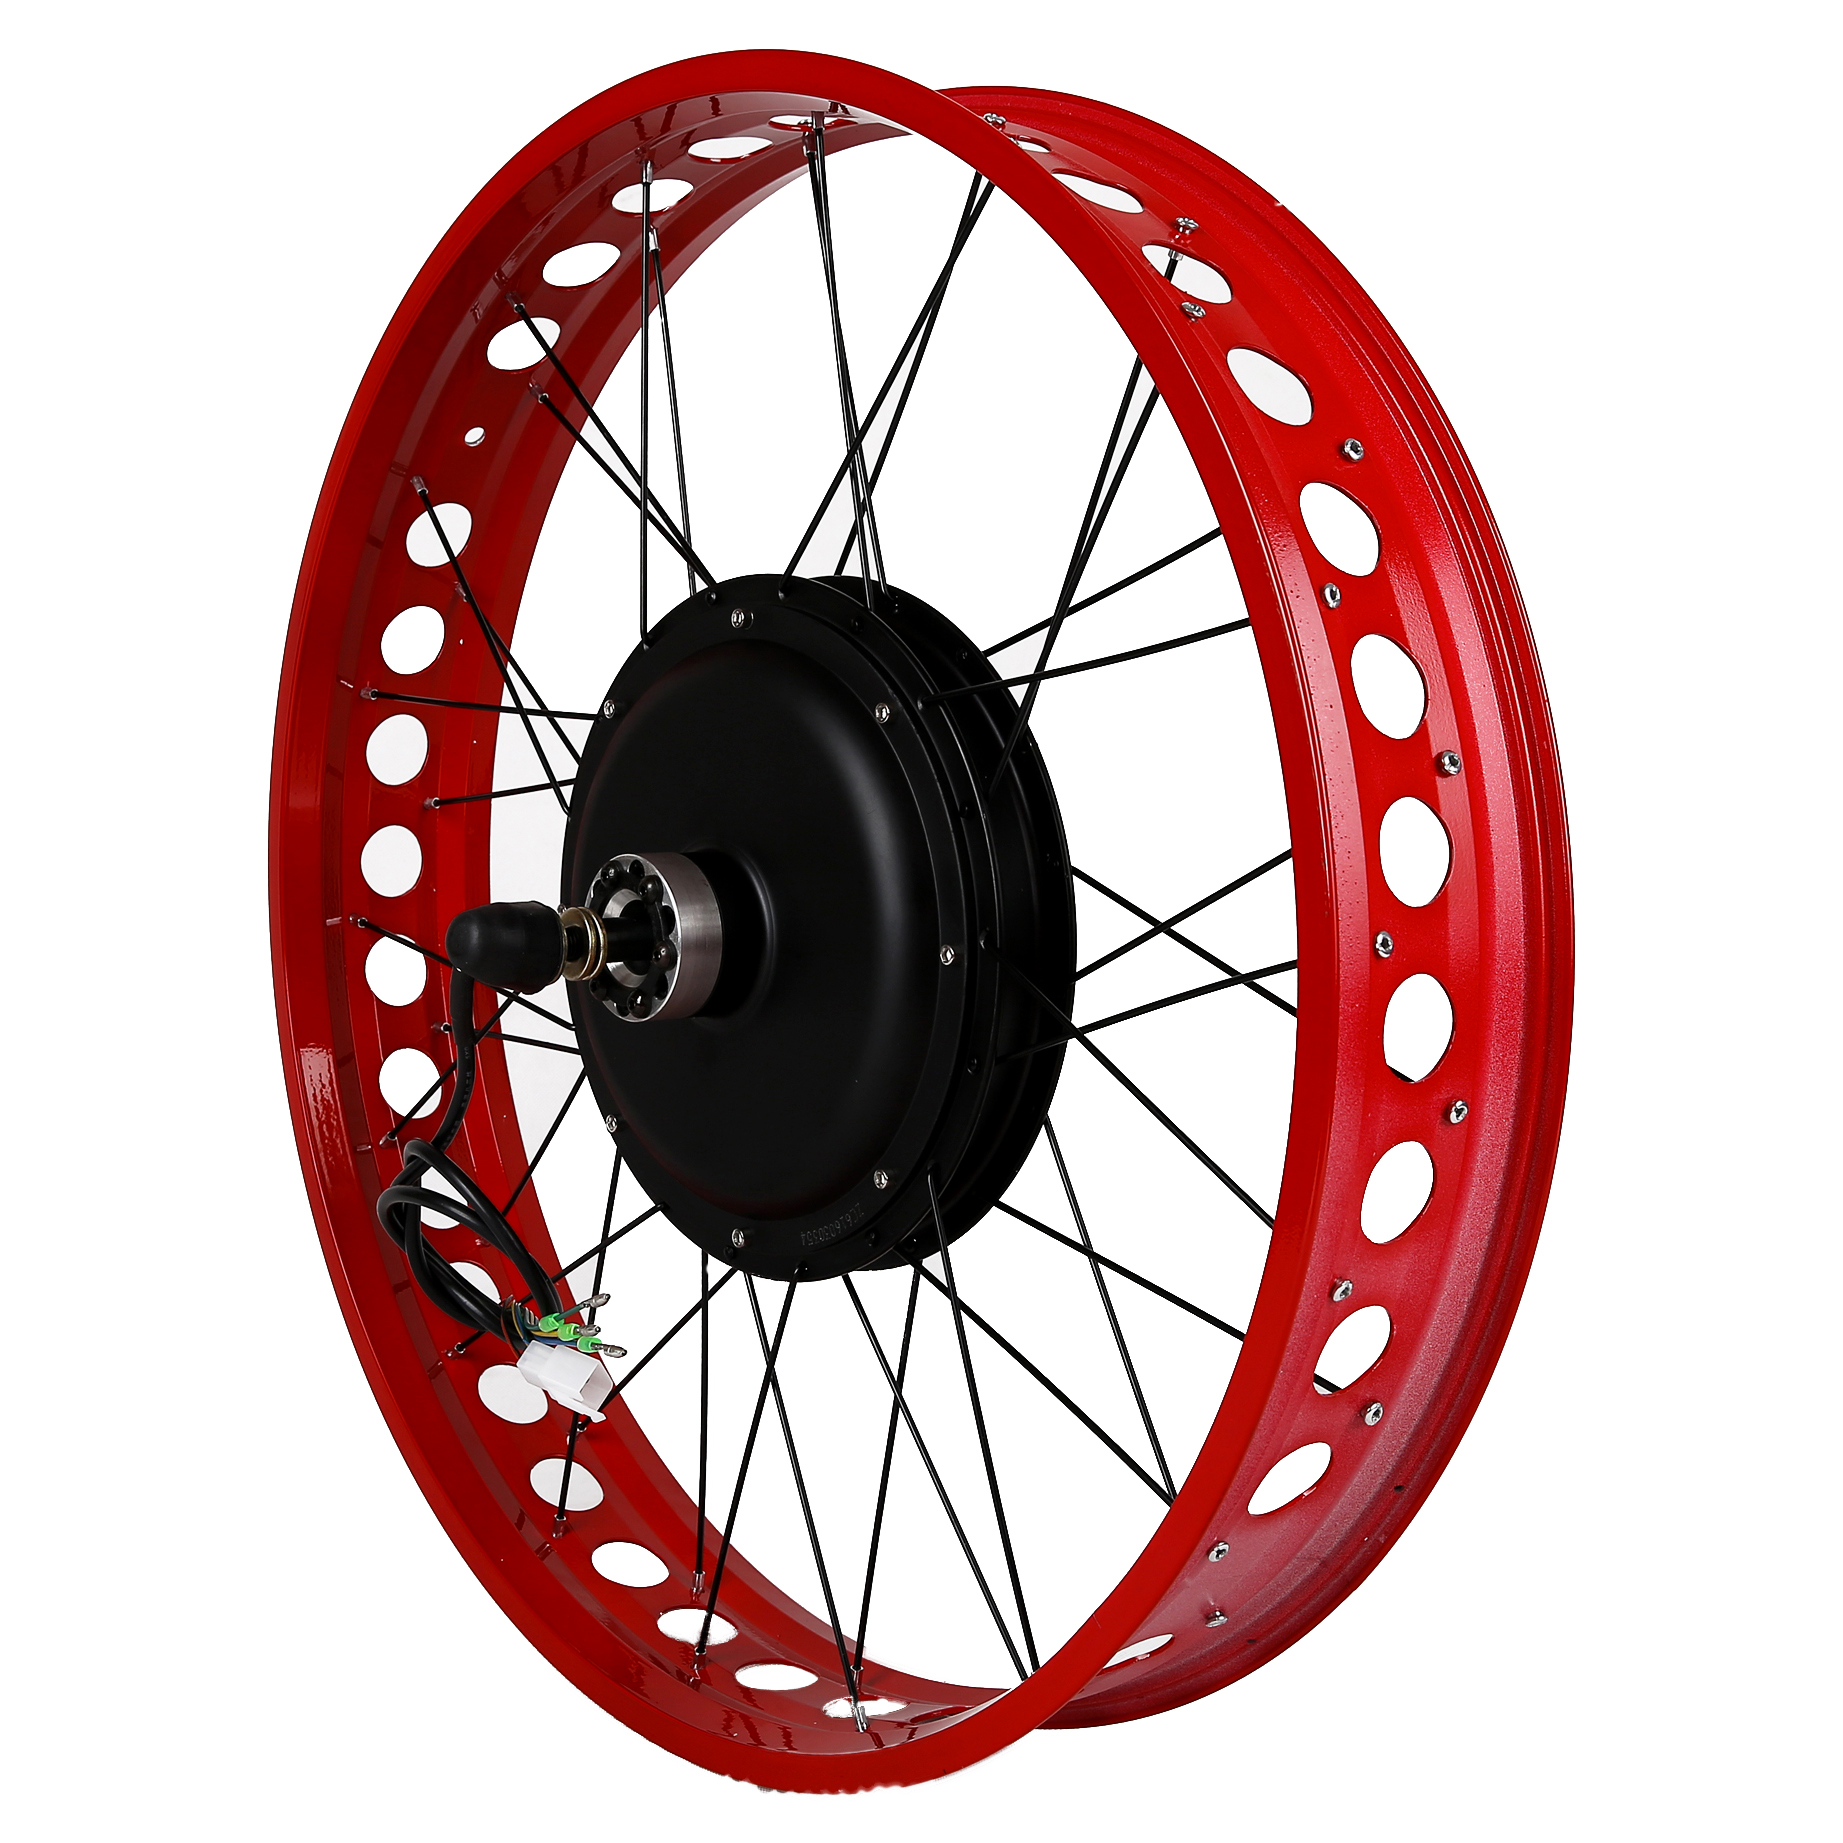 36V 48V 250w 350w 500W 1000W 1500W 2000W 3000W hub motor for electric bicycle